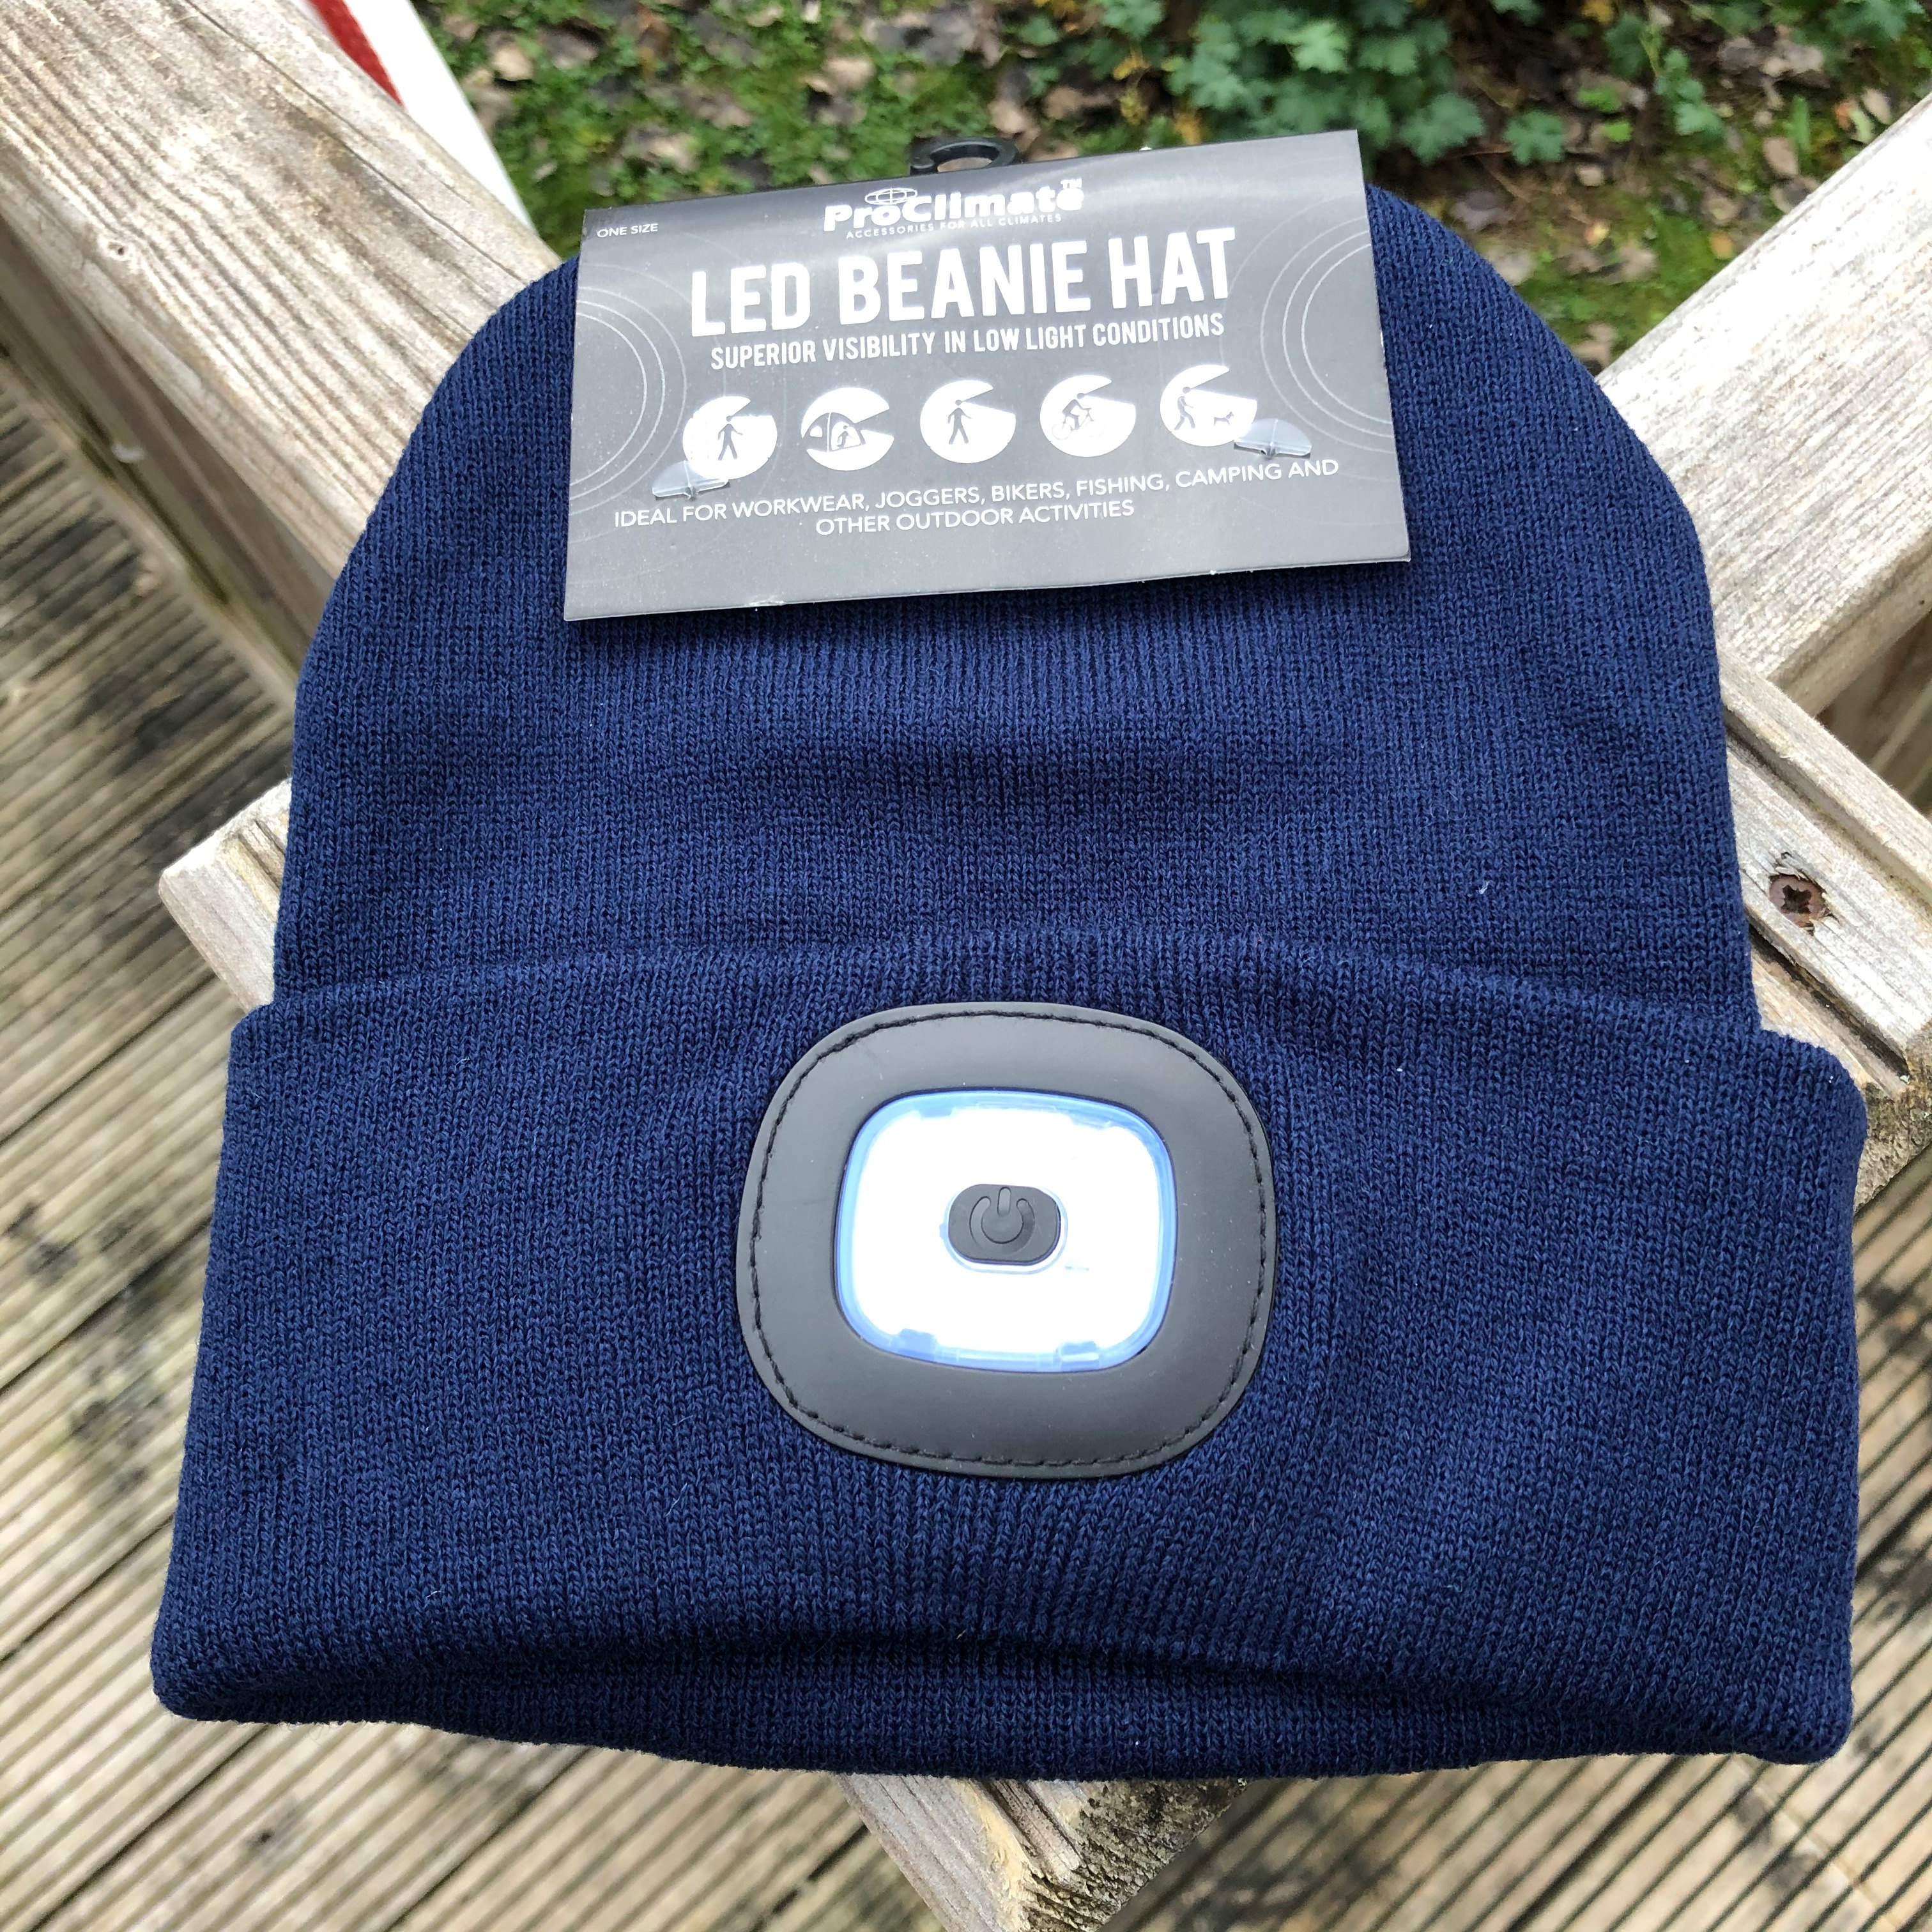 LED Beanie Hat - Navy Blue